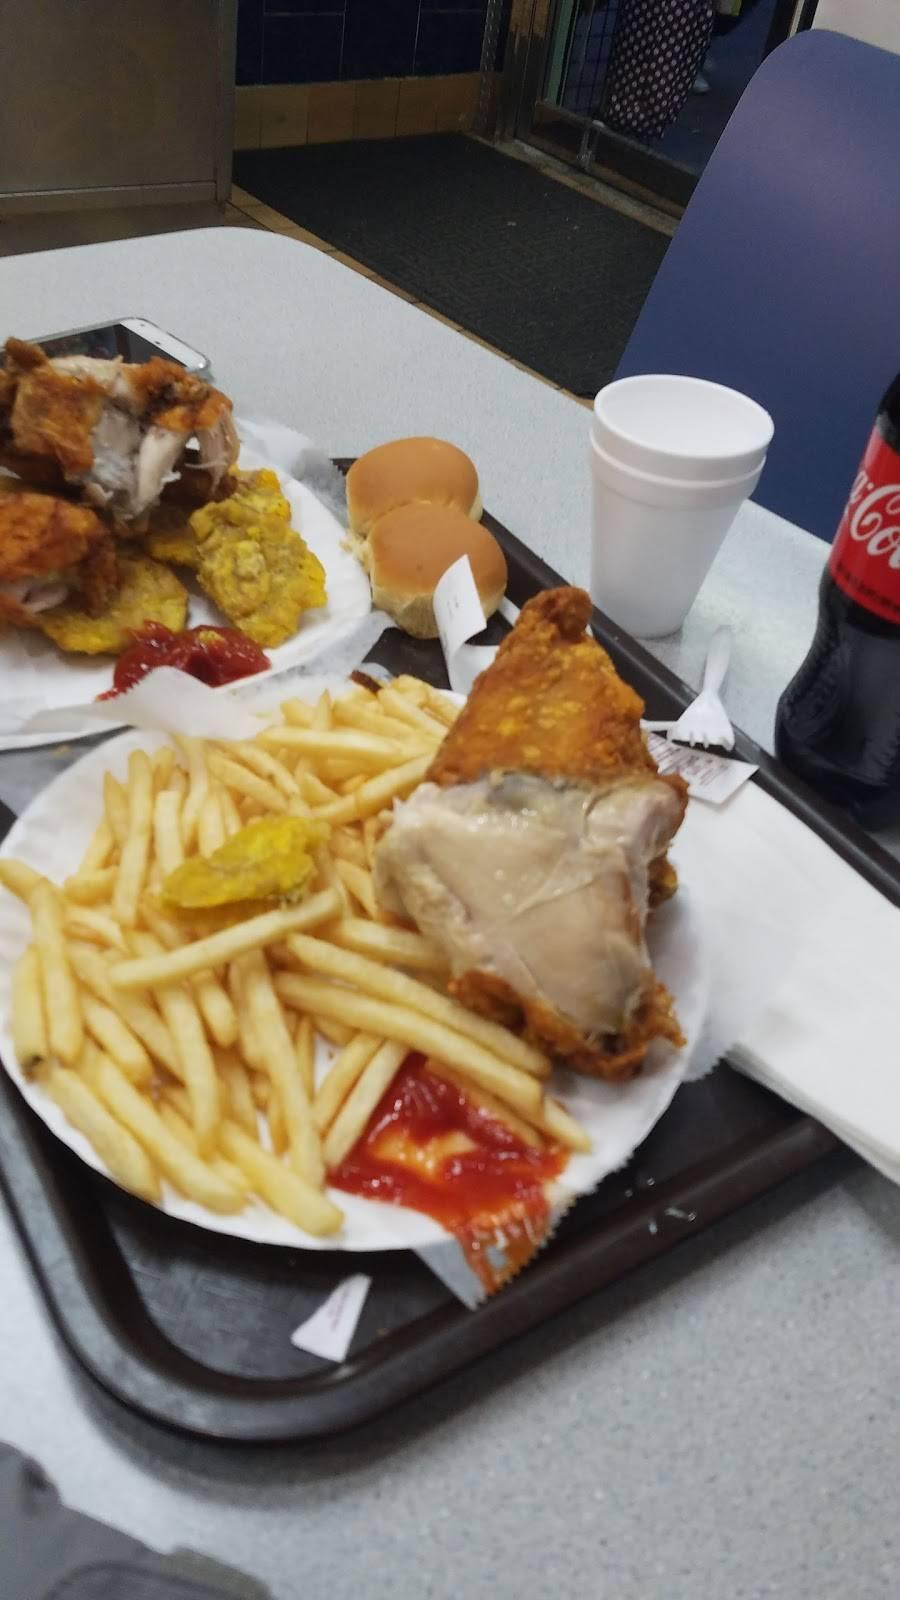 New Kennedy Chicken & Gyro   restaurant   5605 Broadway, Bronx, NY 10463, USA   7184321181 OR +1 718-432-1181